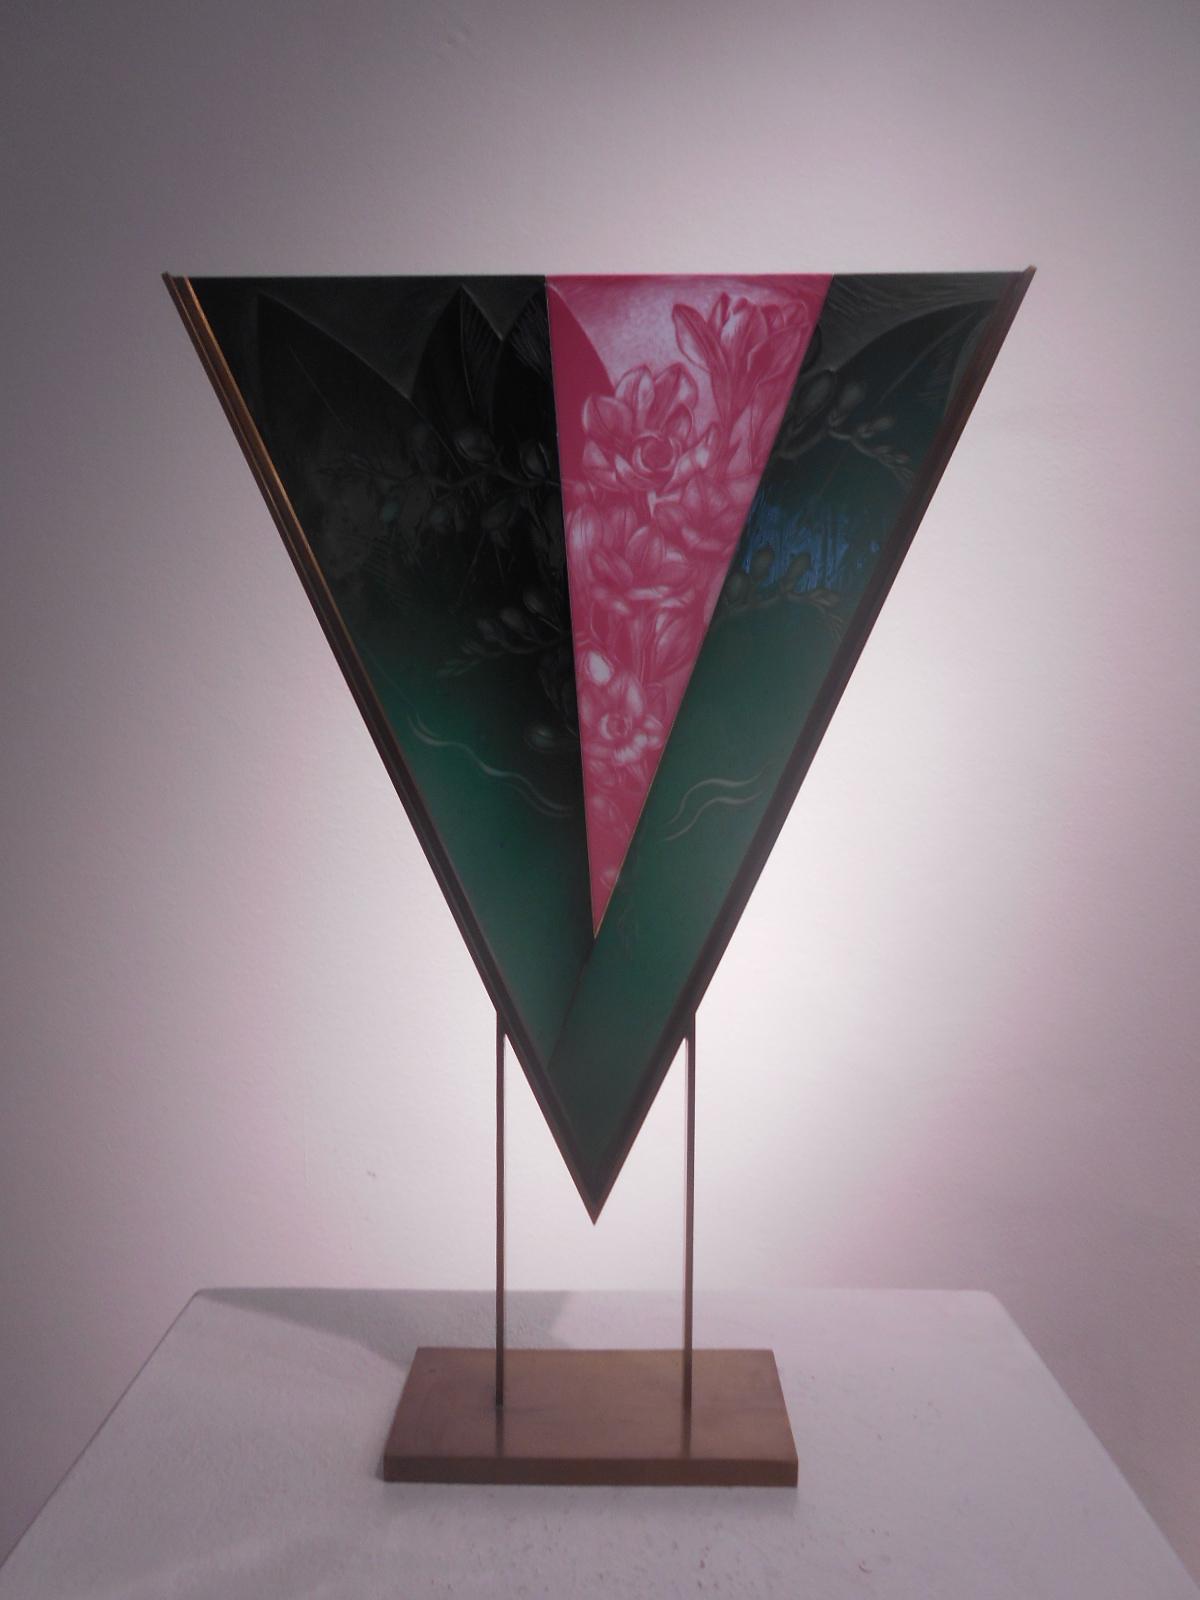 Votrubová Jaroslava-FLOWER-33x45,5x9cm